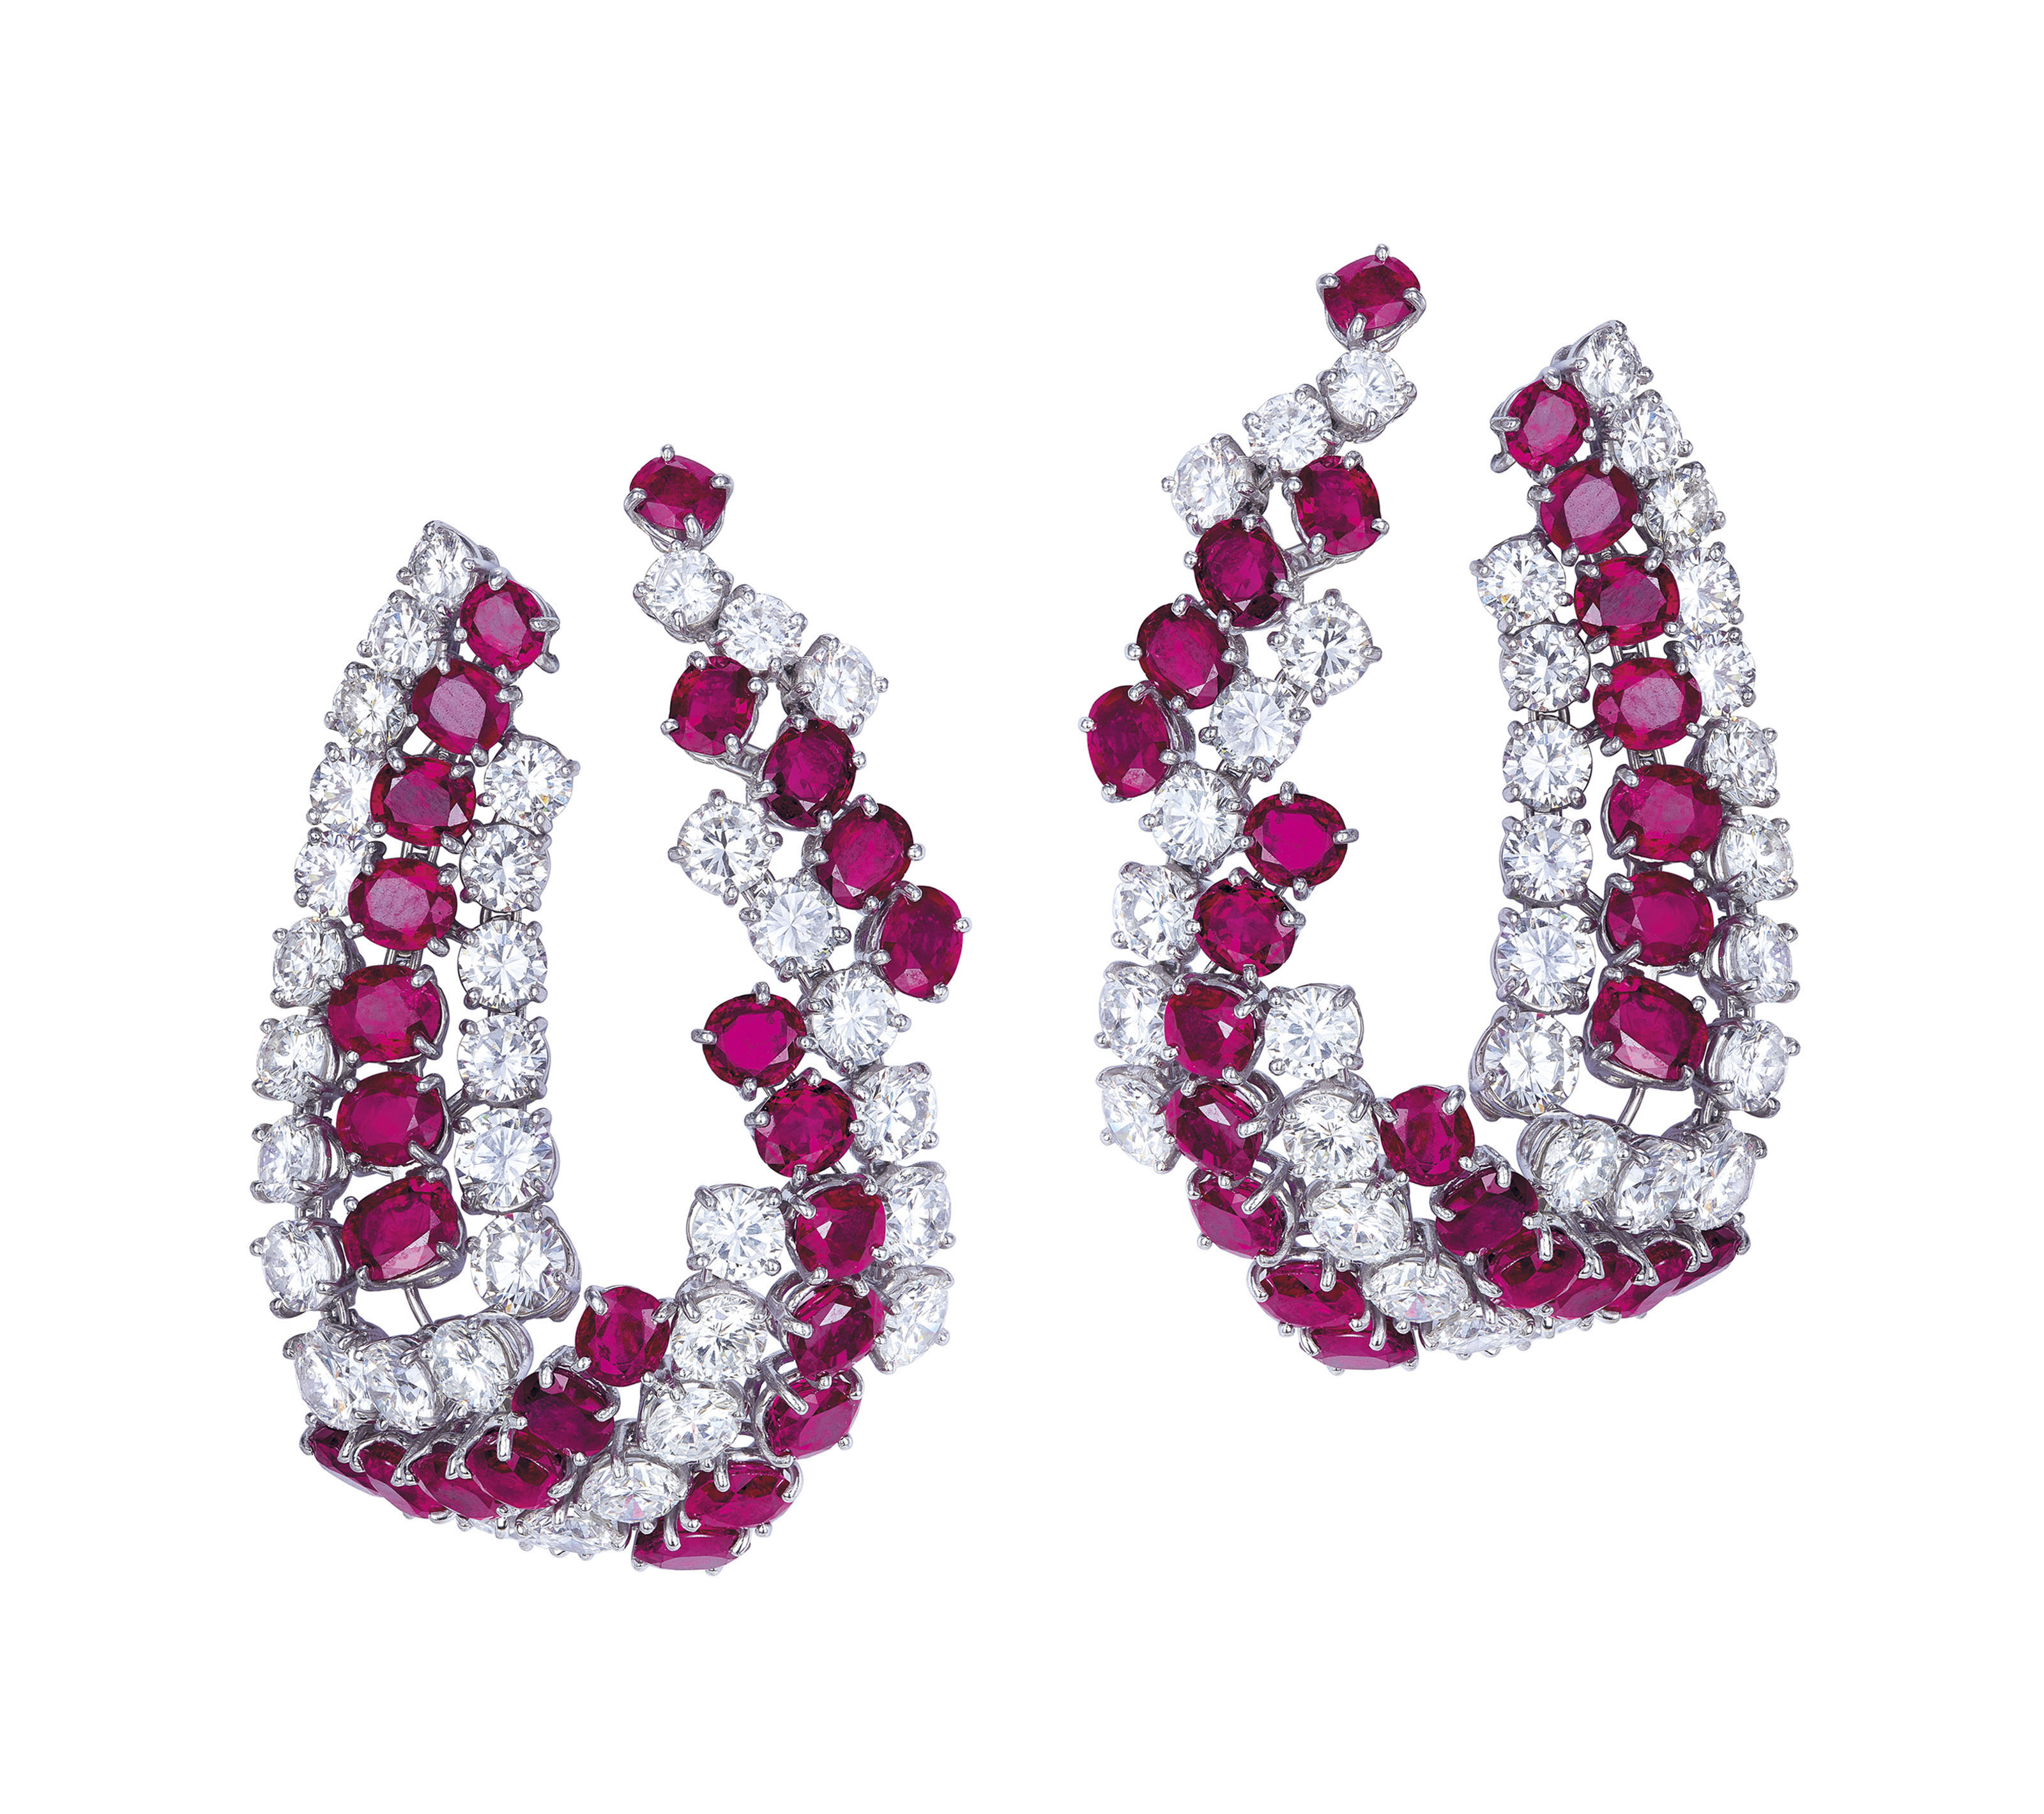 RUBY AND DIAMOND EARRINGS, HAR